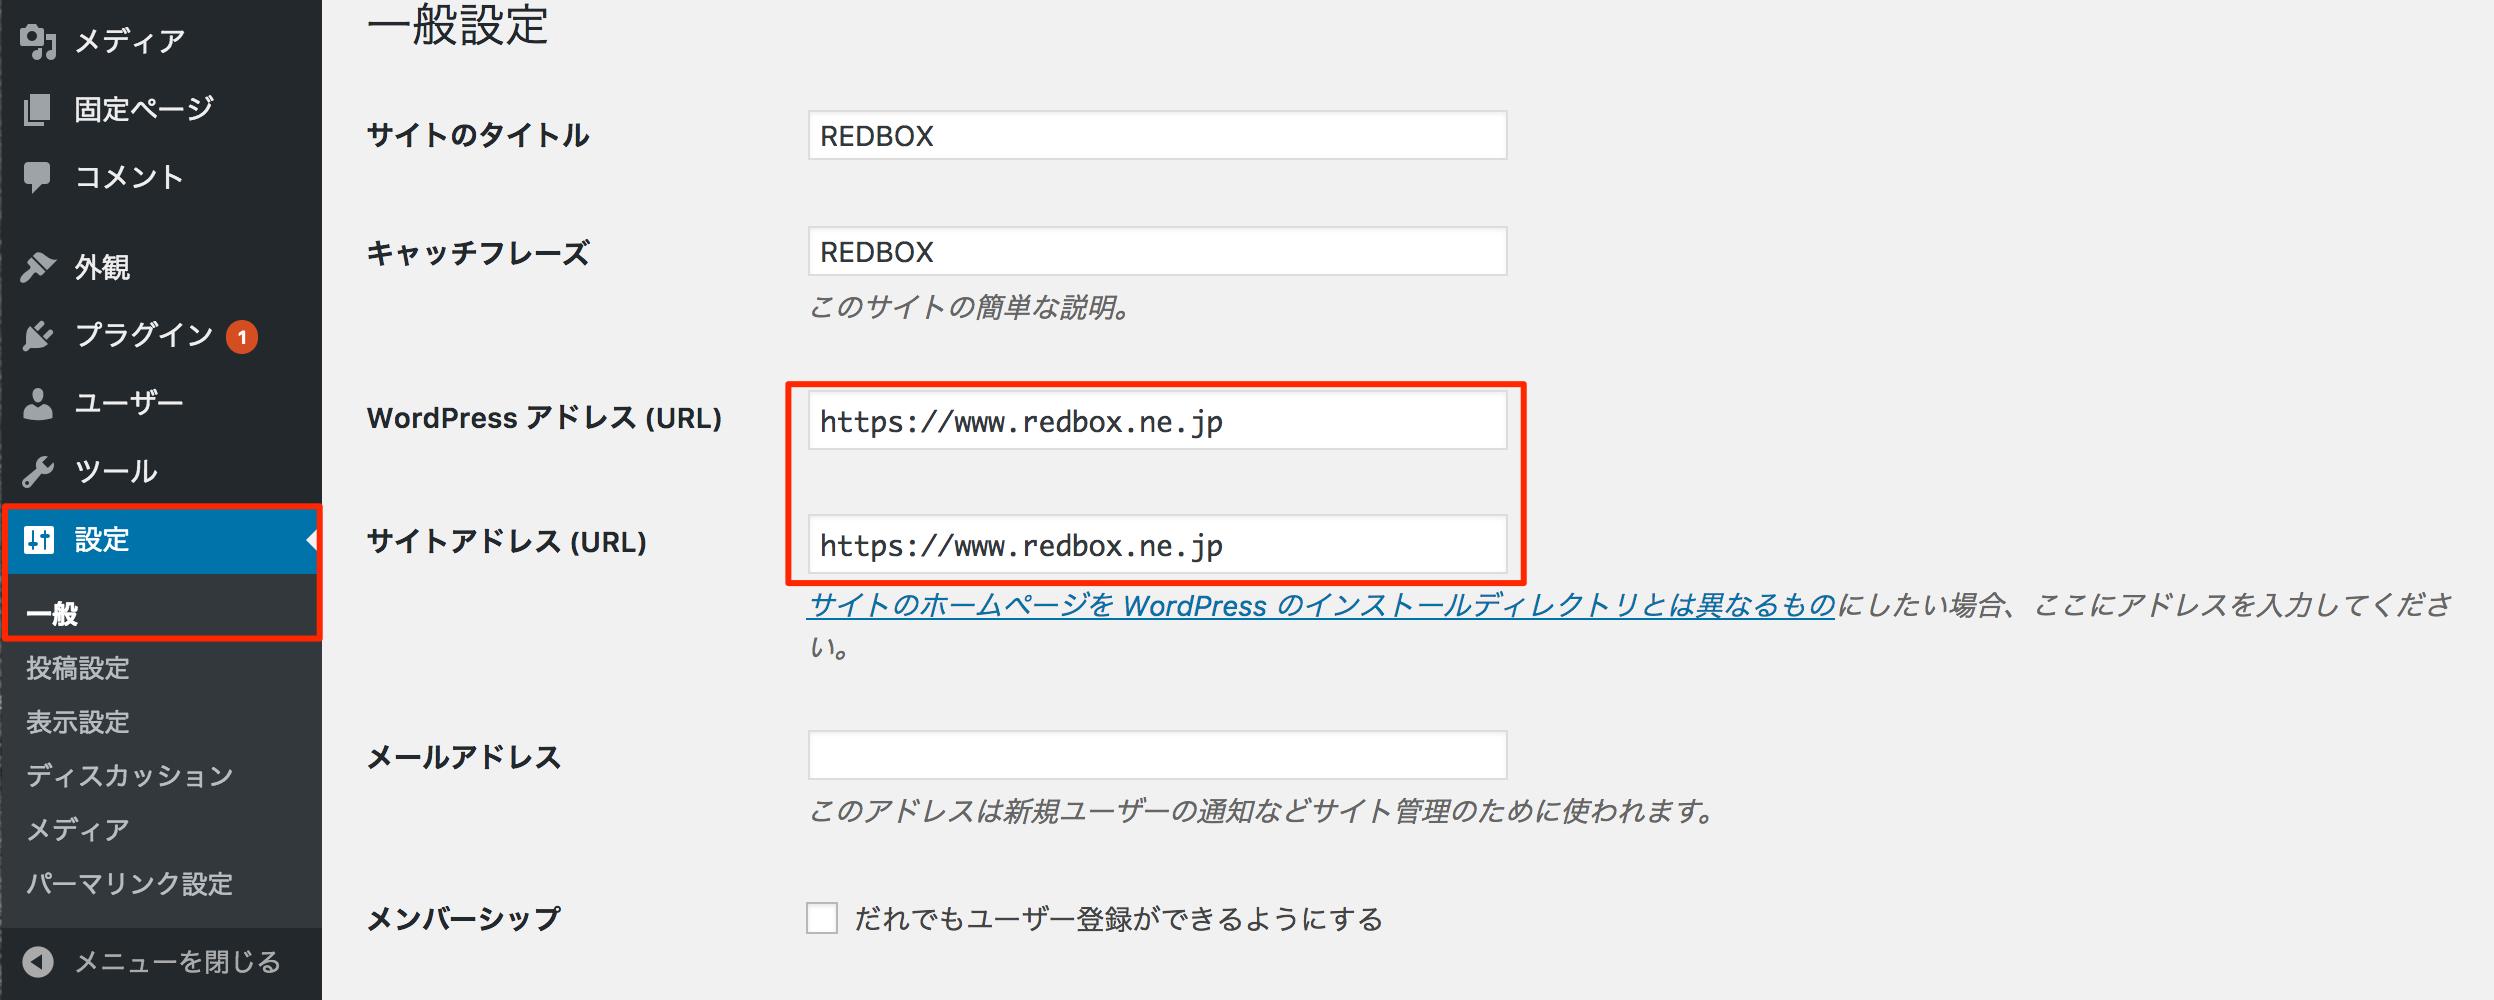 wordpress サイトSSL設定 HTTPS